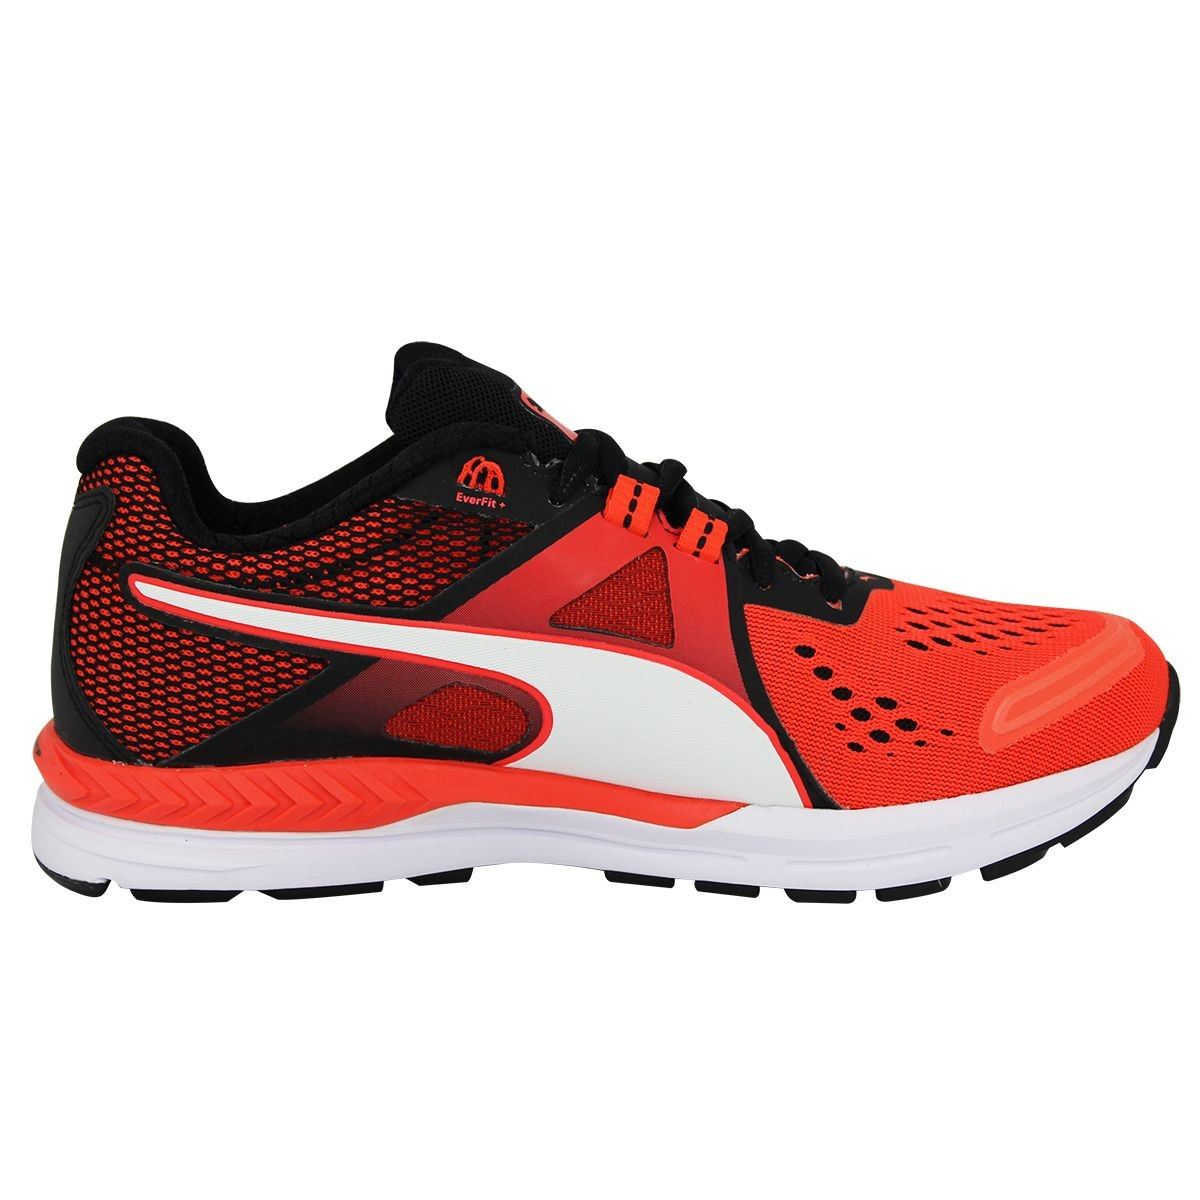 chaussures running homme puma